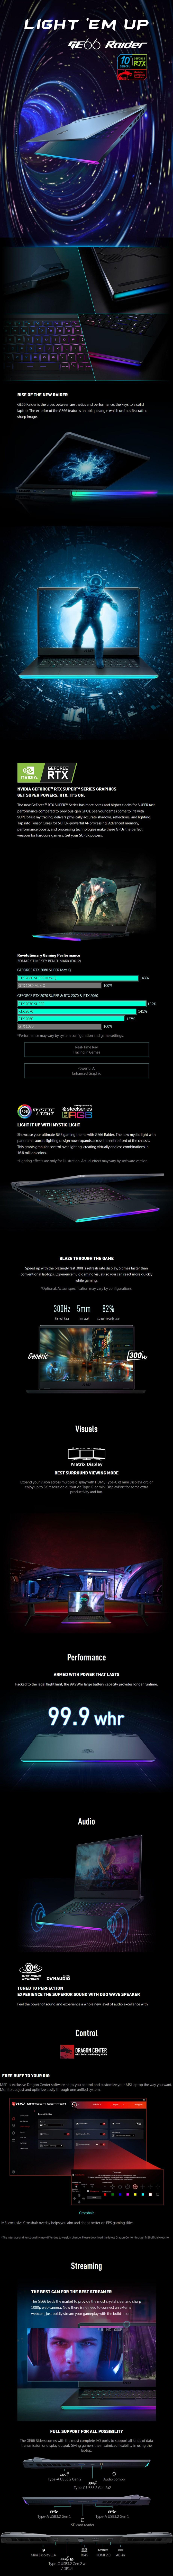 "MSI GE66 Raider 10SFS 15.6"" 300Hz Gaming Laptop i7-10875H 16GB 1TB RTX2080S W10P - Overview 1"